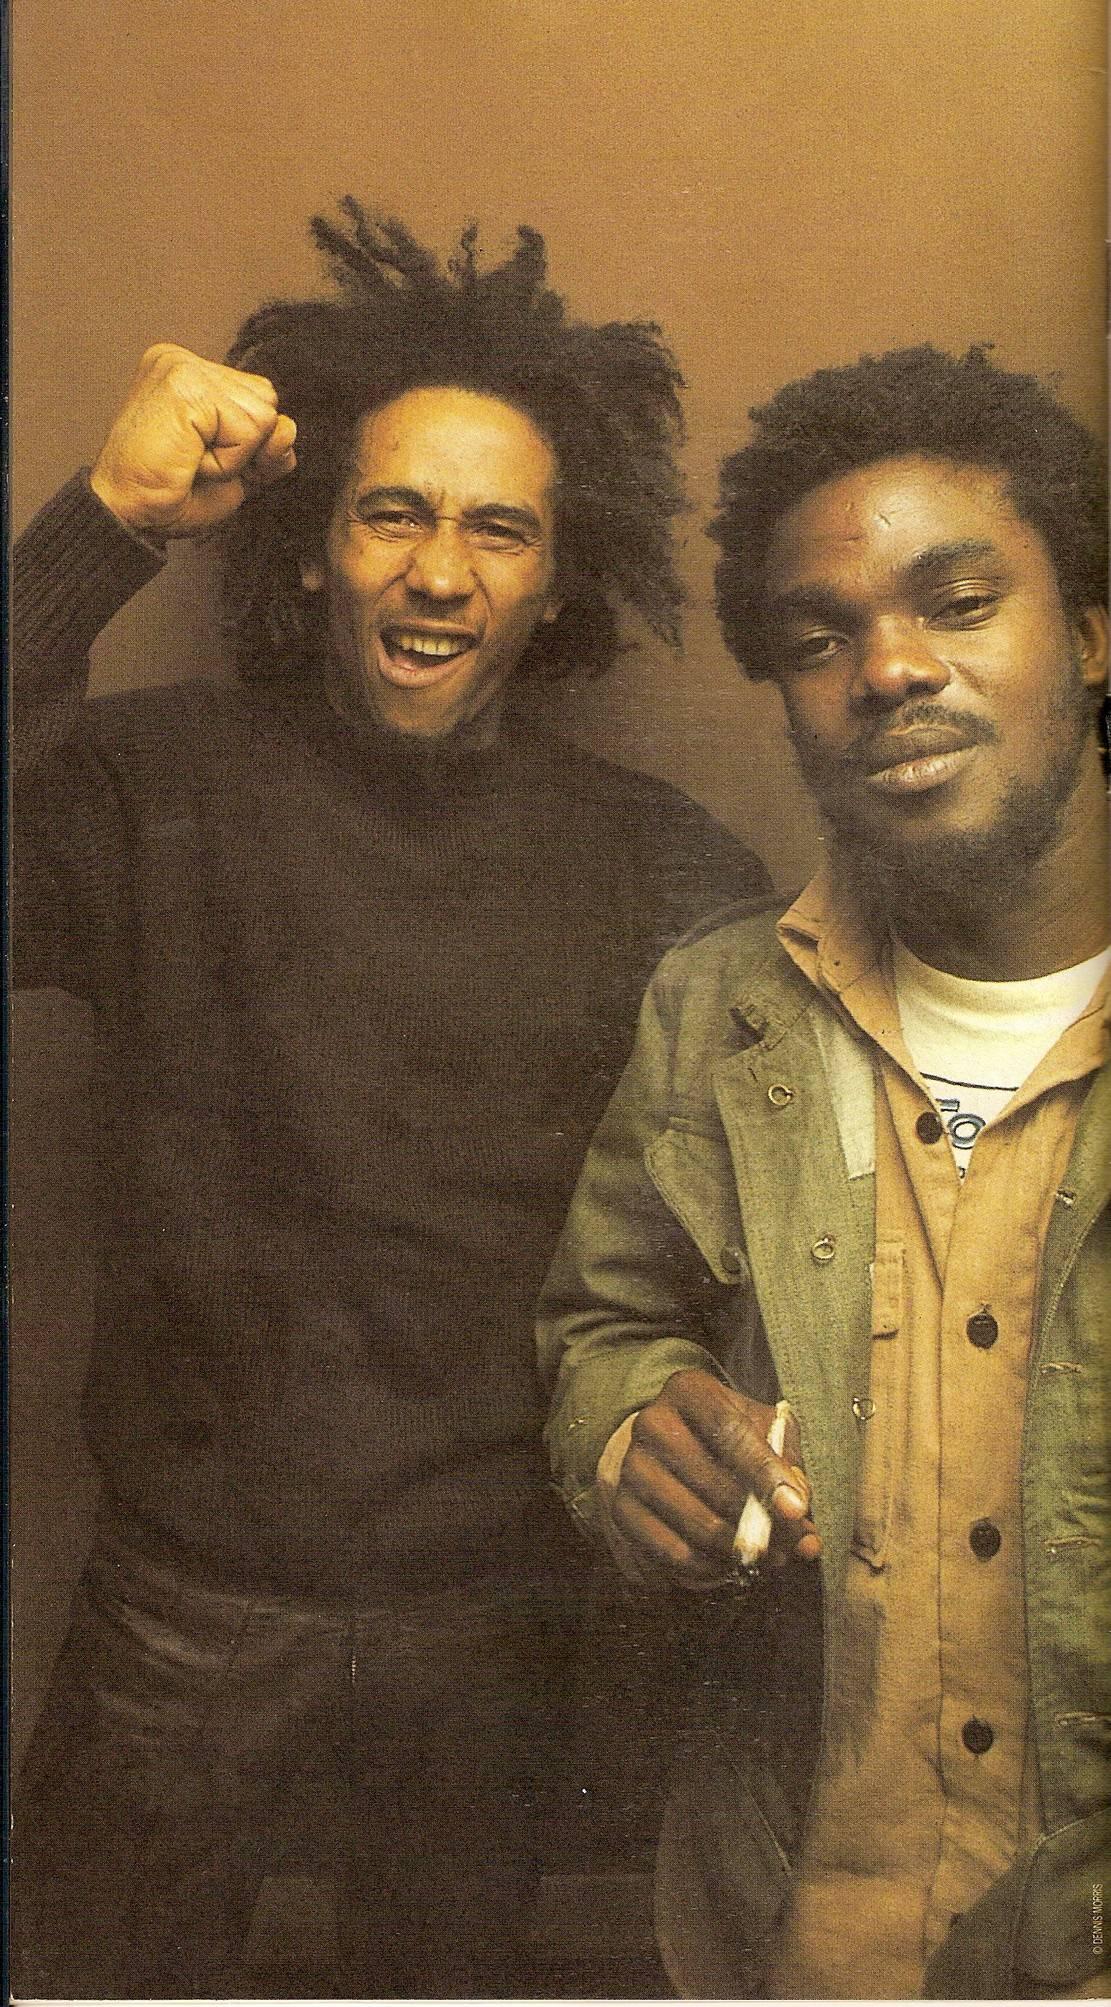 Bob Marley & The Wailers - Rebel (2002) {4 CD Long Boxed Set JAD-EMI 541 393-2}